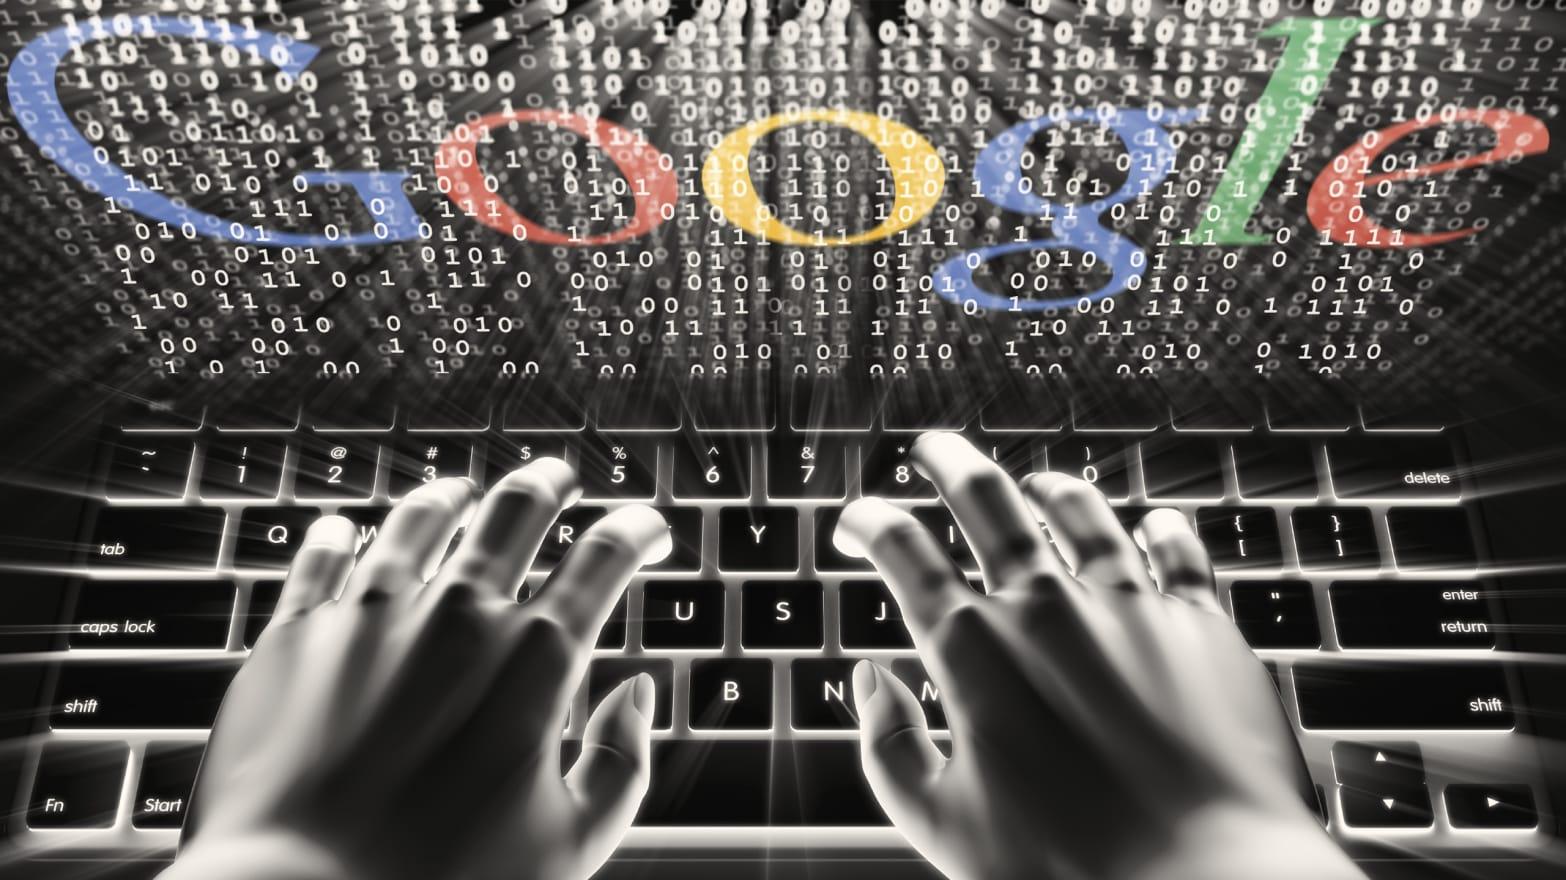 ISIS Hackers' Googled Their Hit List